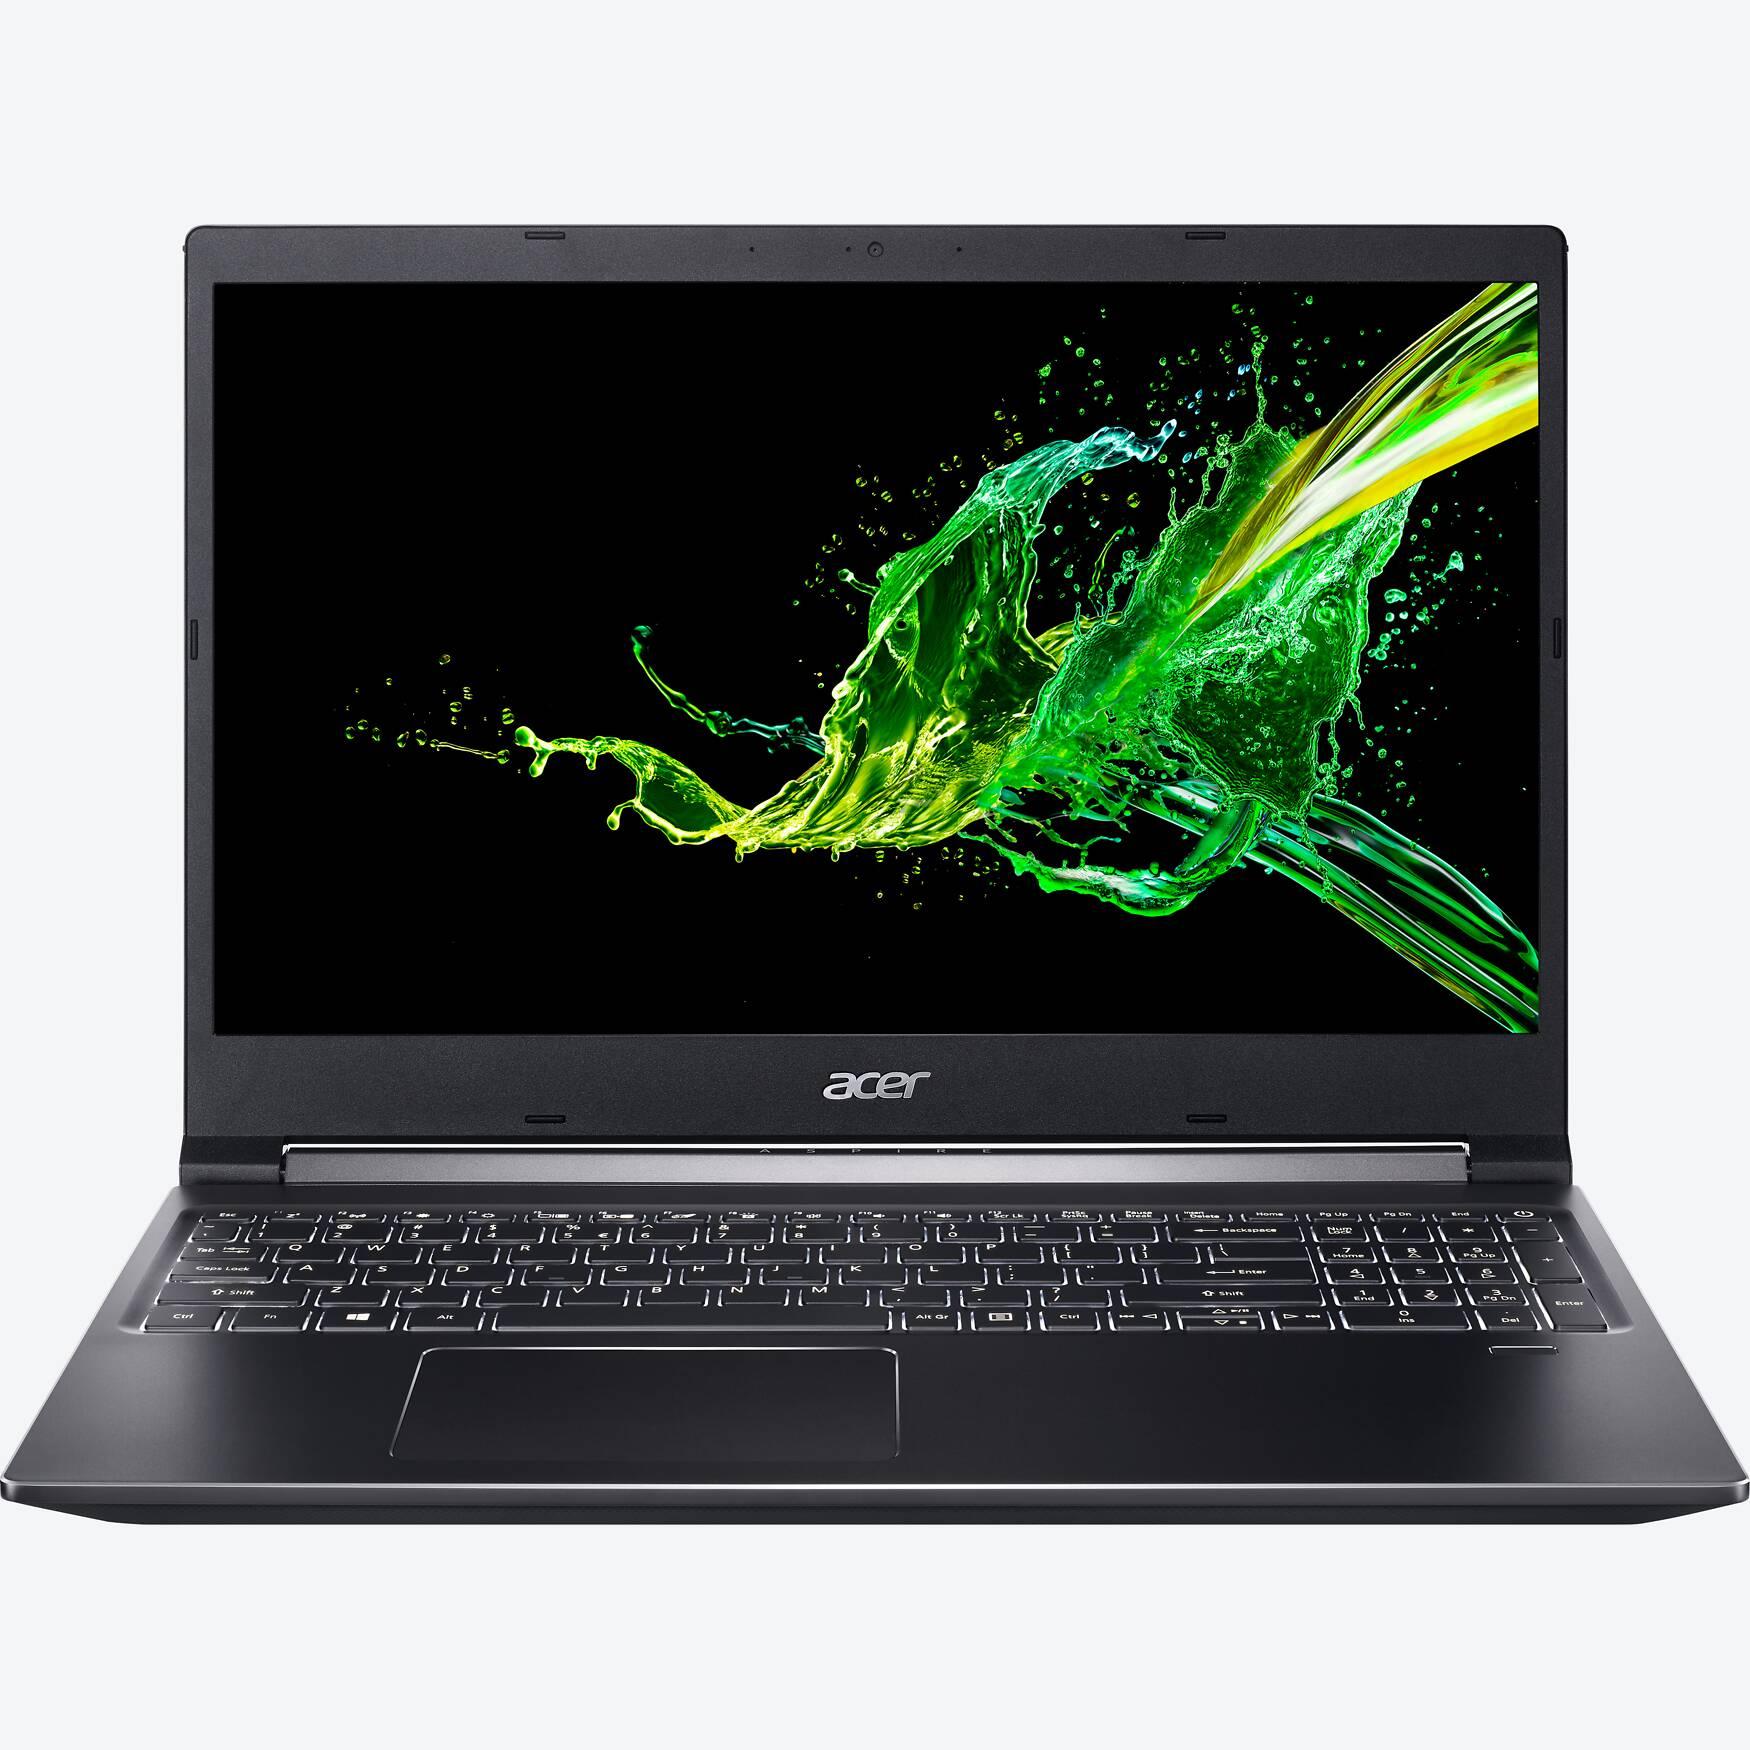 Acer Aspire 7 A715-74G-57L9